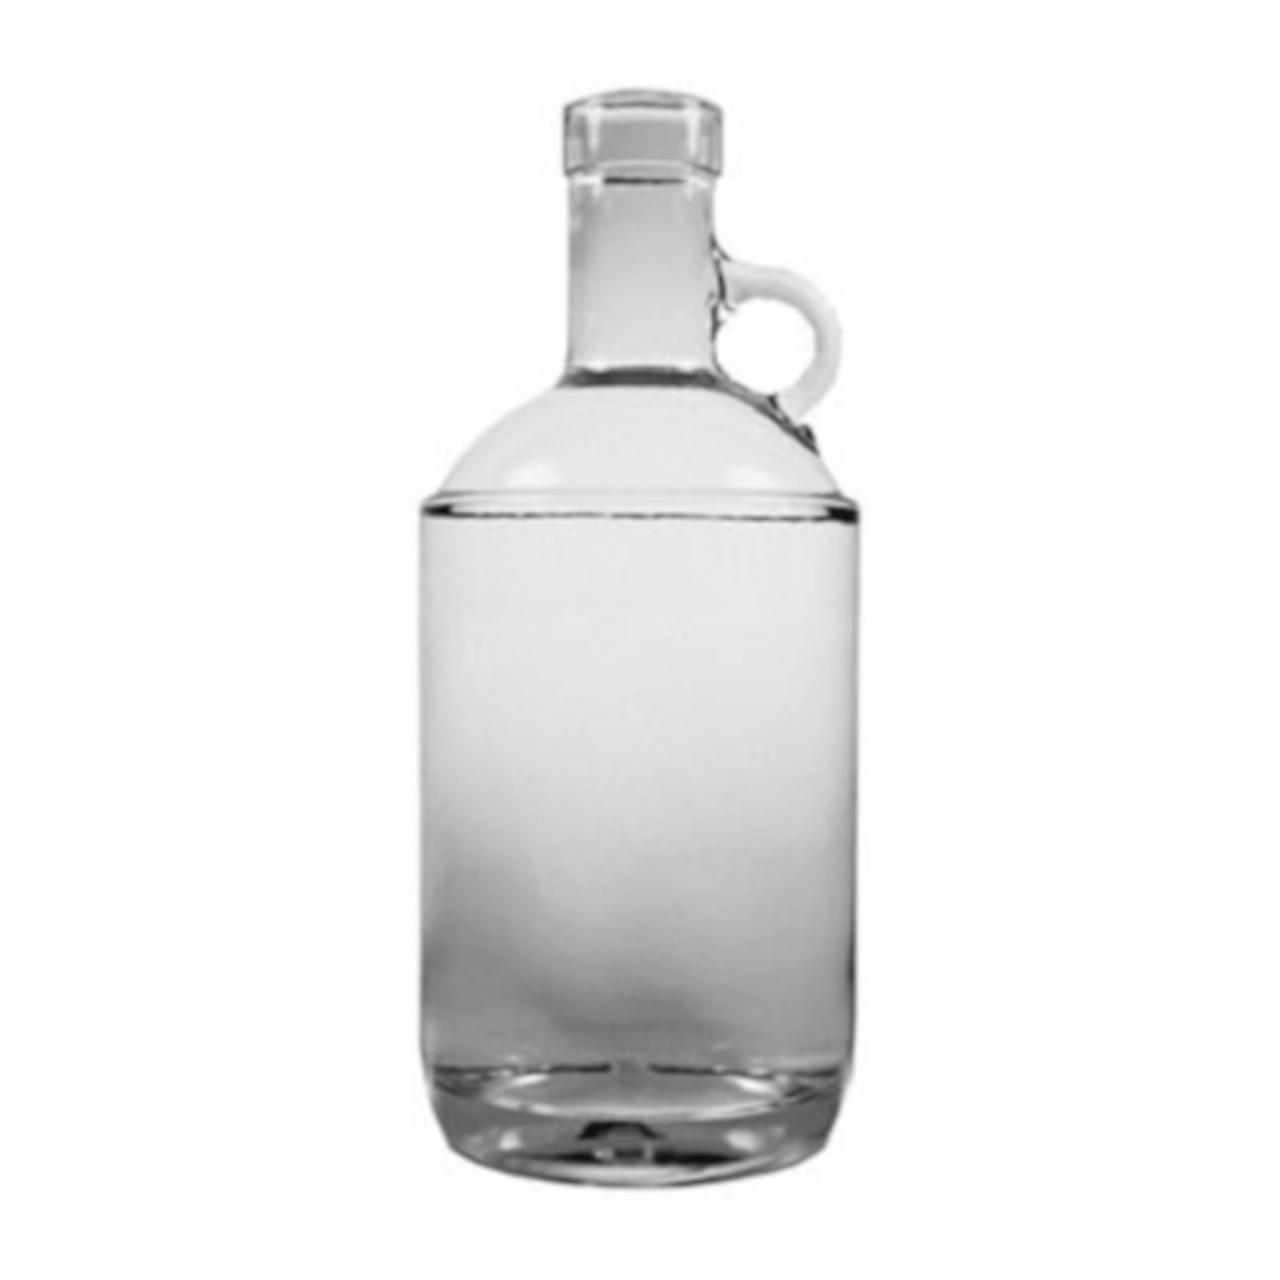 Distilling Bottles